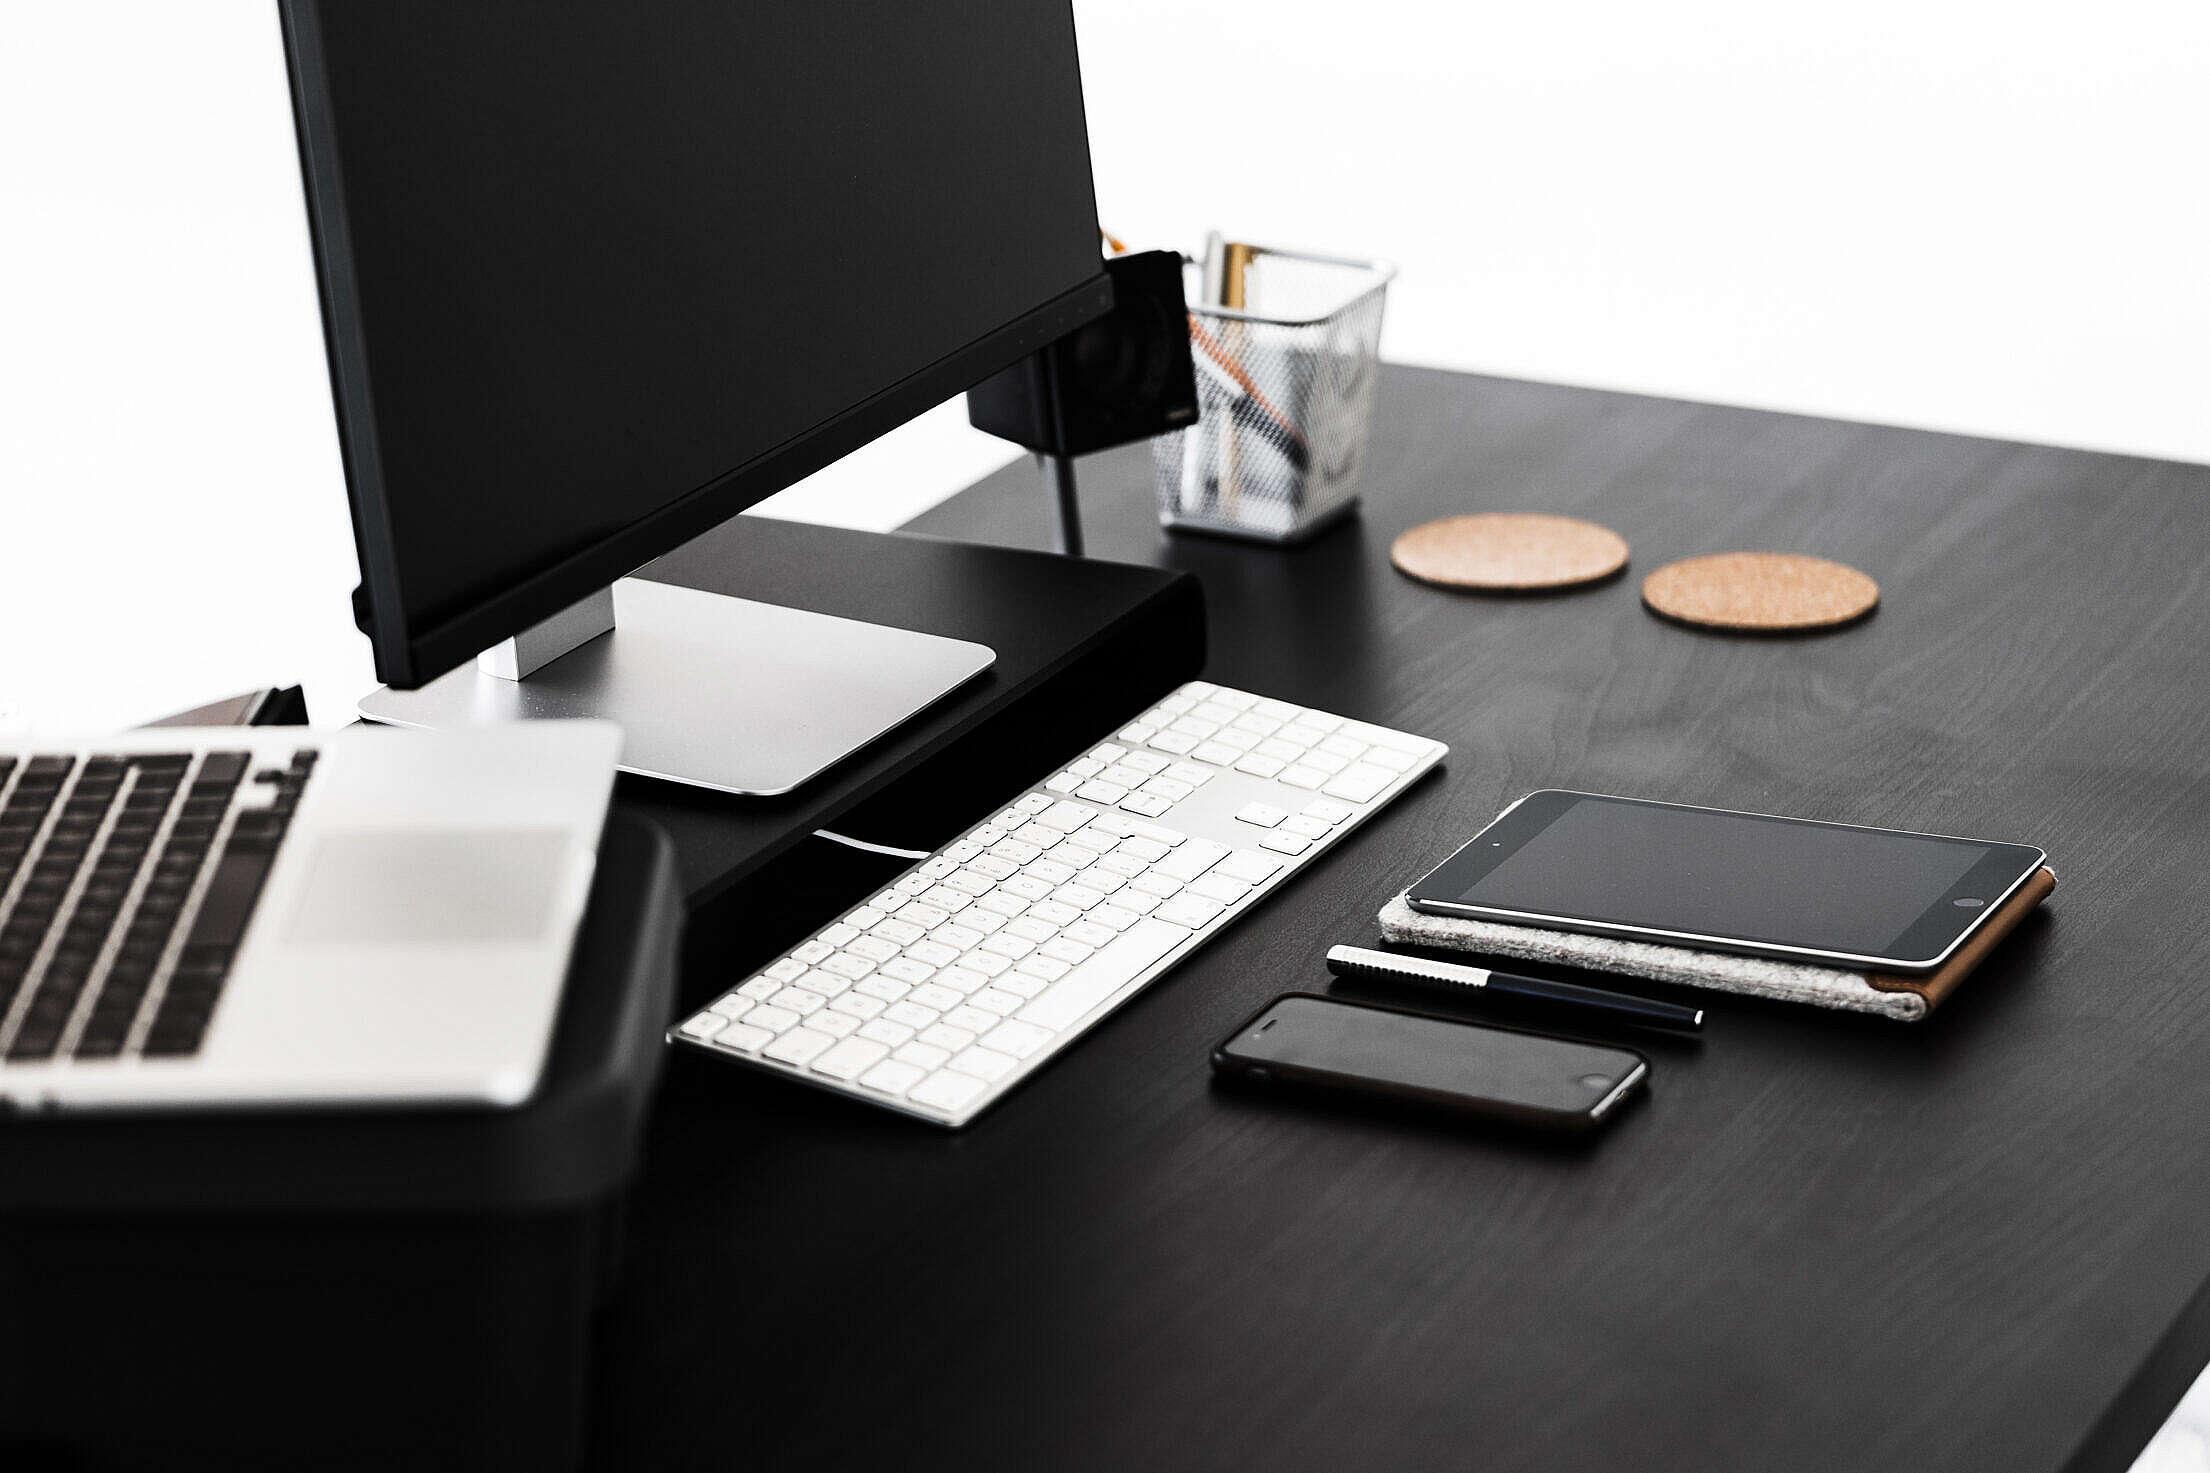 Black Modern Minimalistic Desk Free Stock Photo